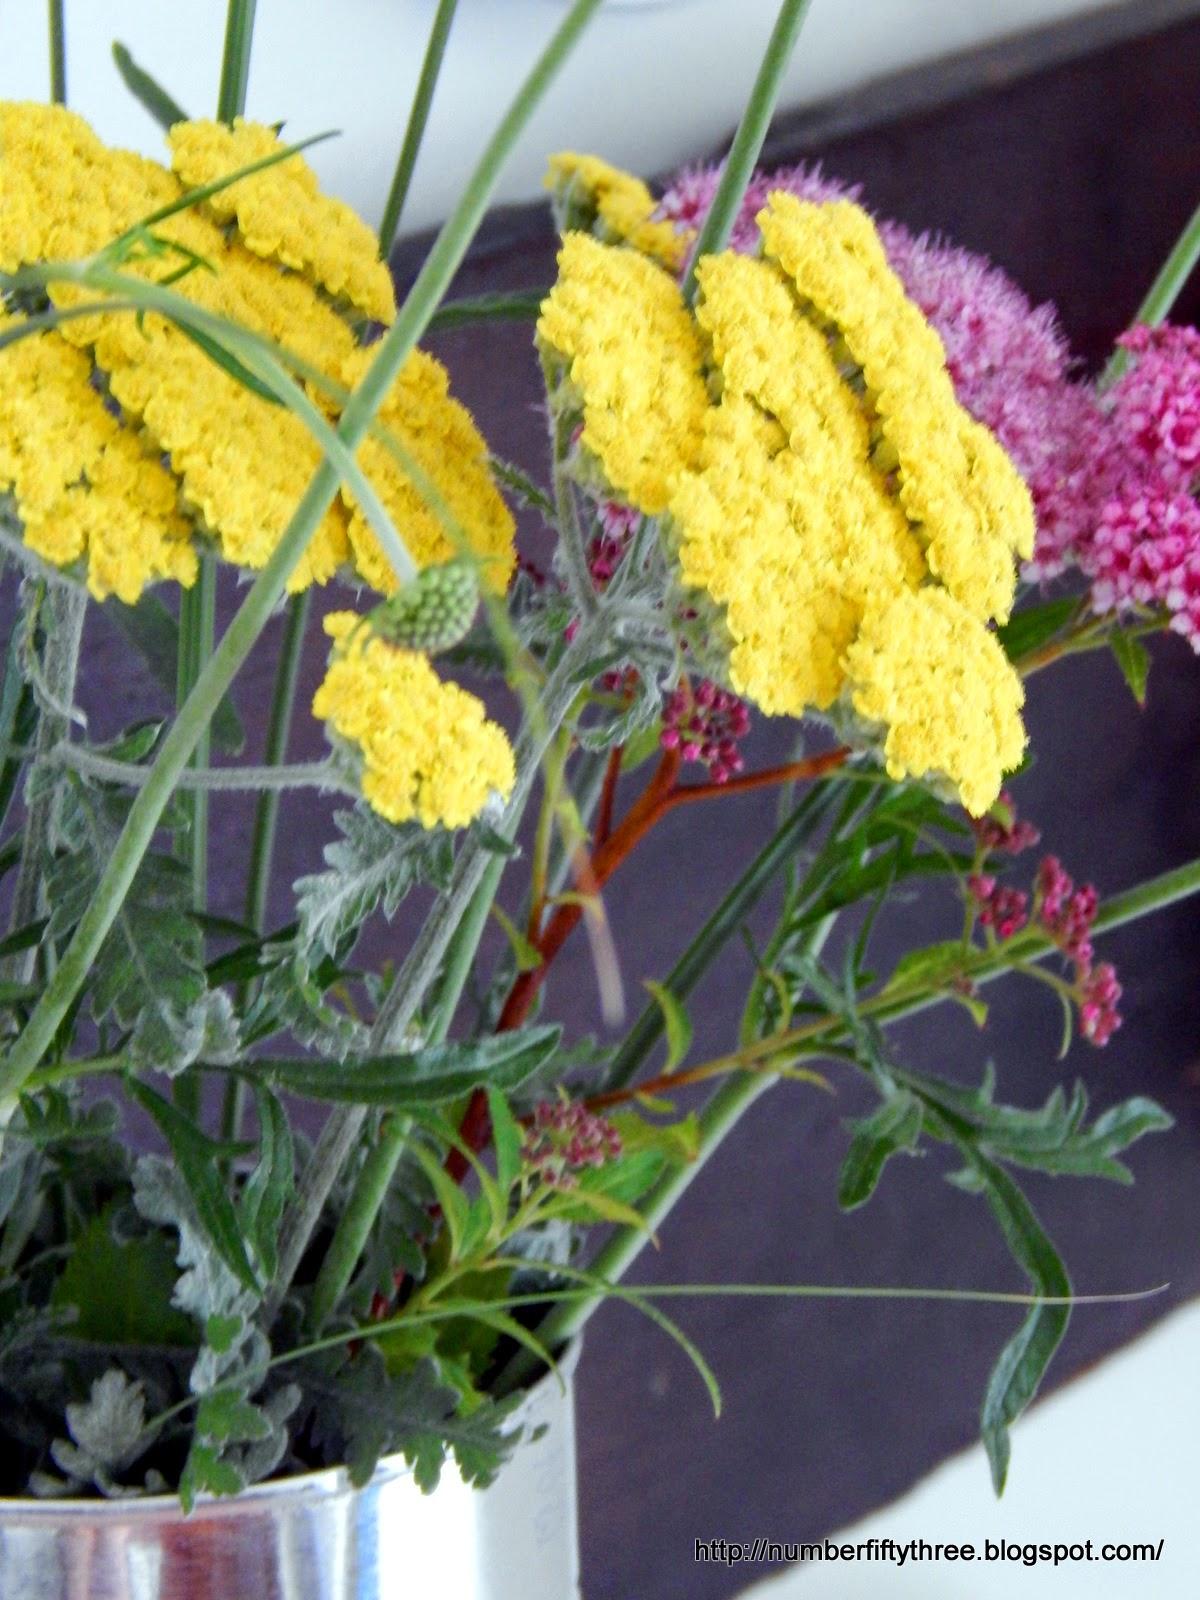 Summer wild flowers make apretty display